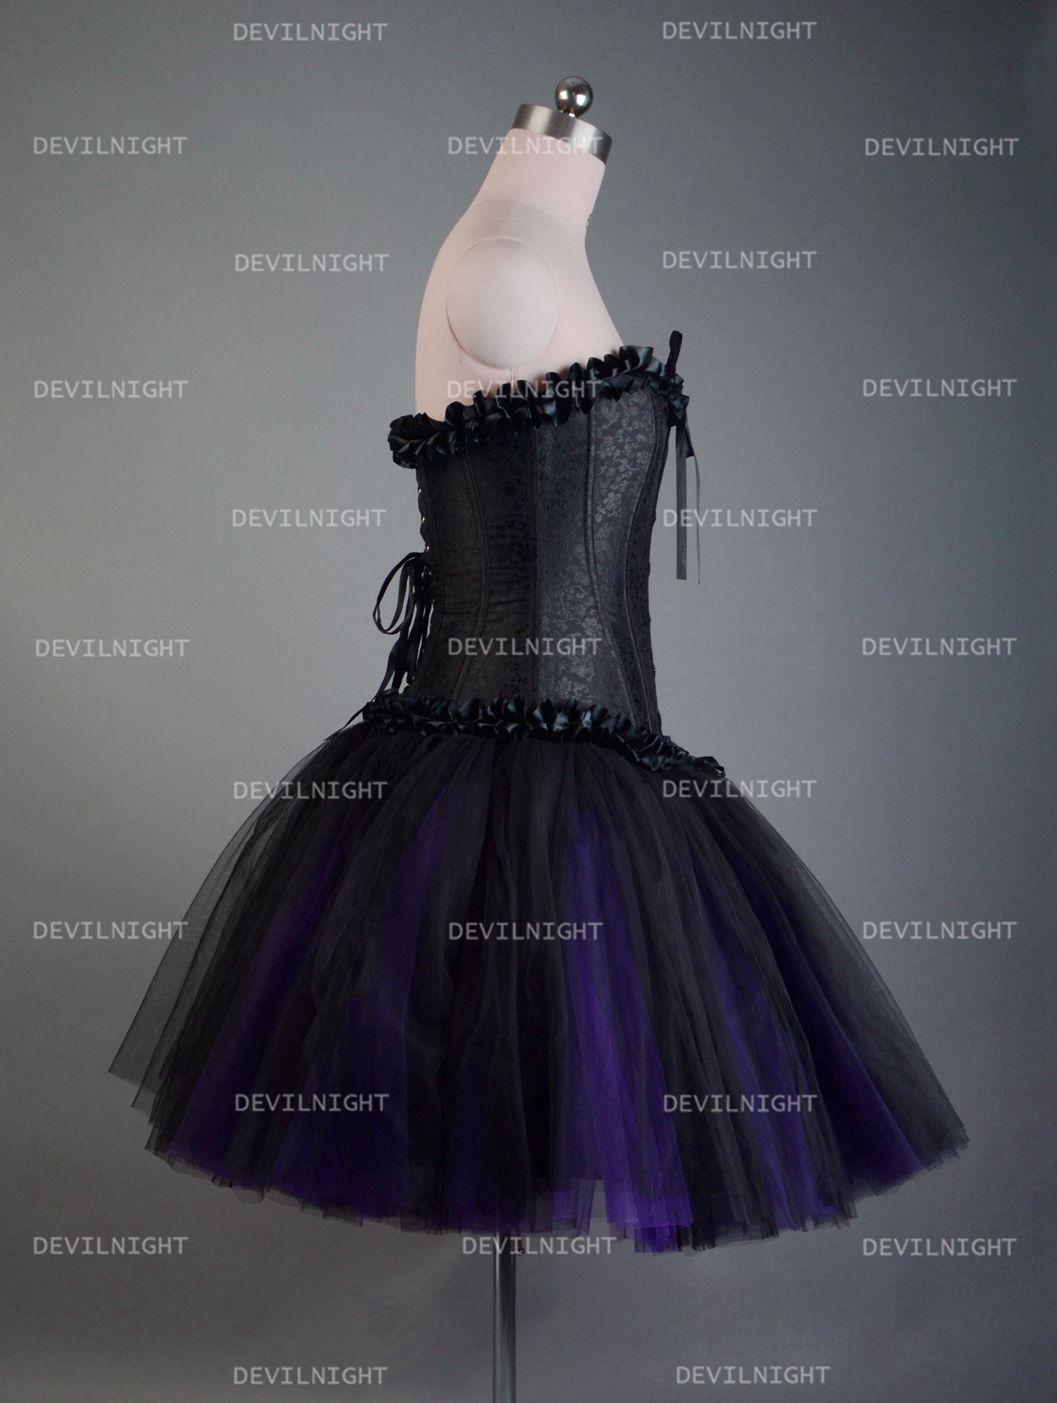 fashion_black_and_purple_short_gothic_corset_burlesque_party_dress_dresses_3.jpg